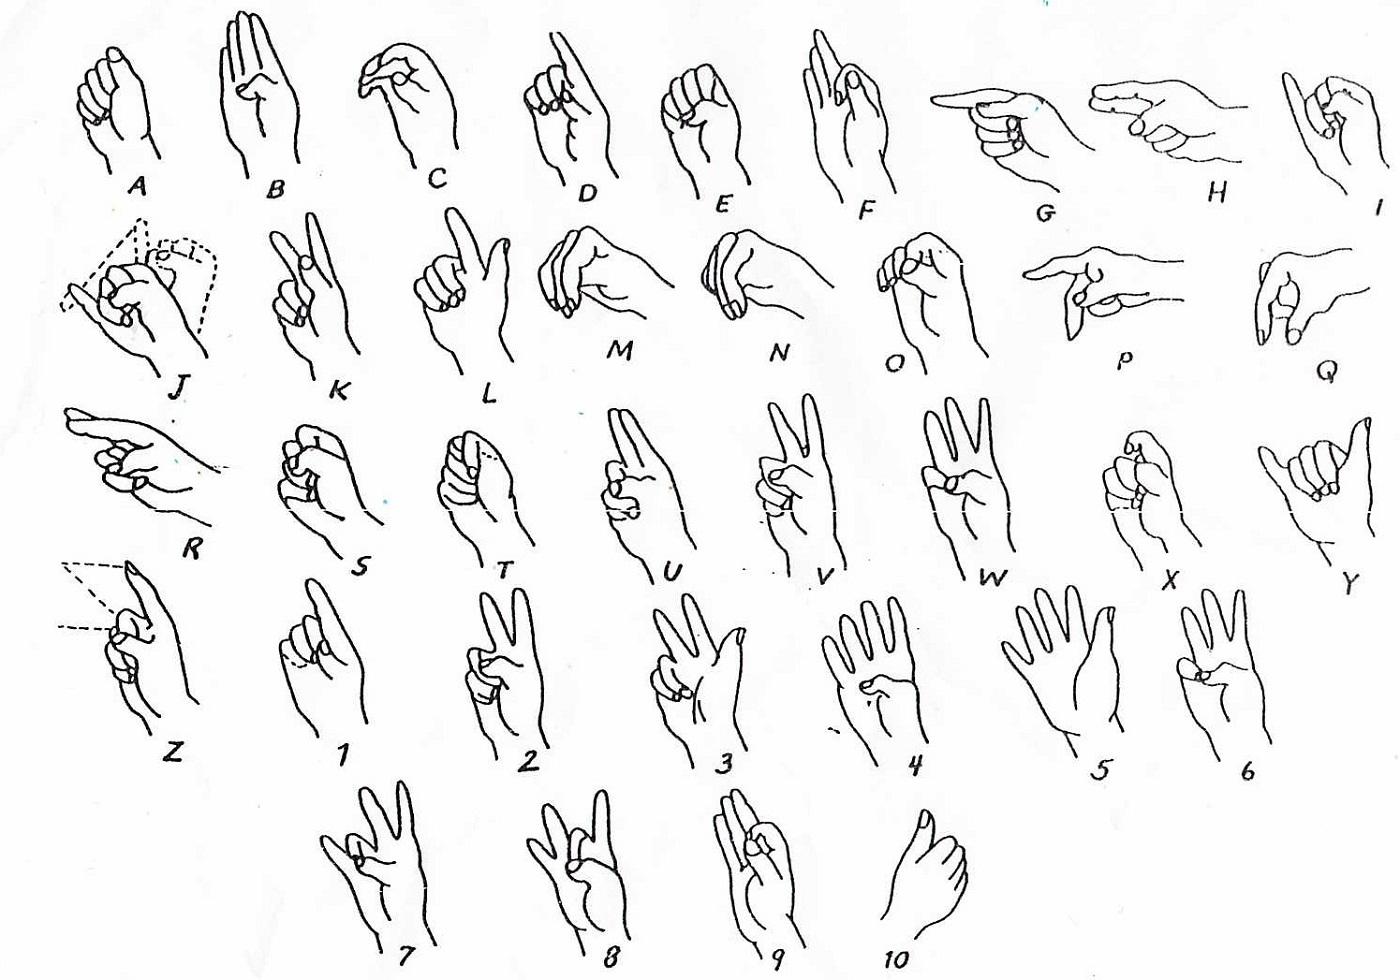 how to speak sign language words